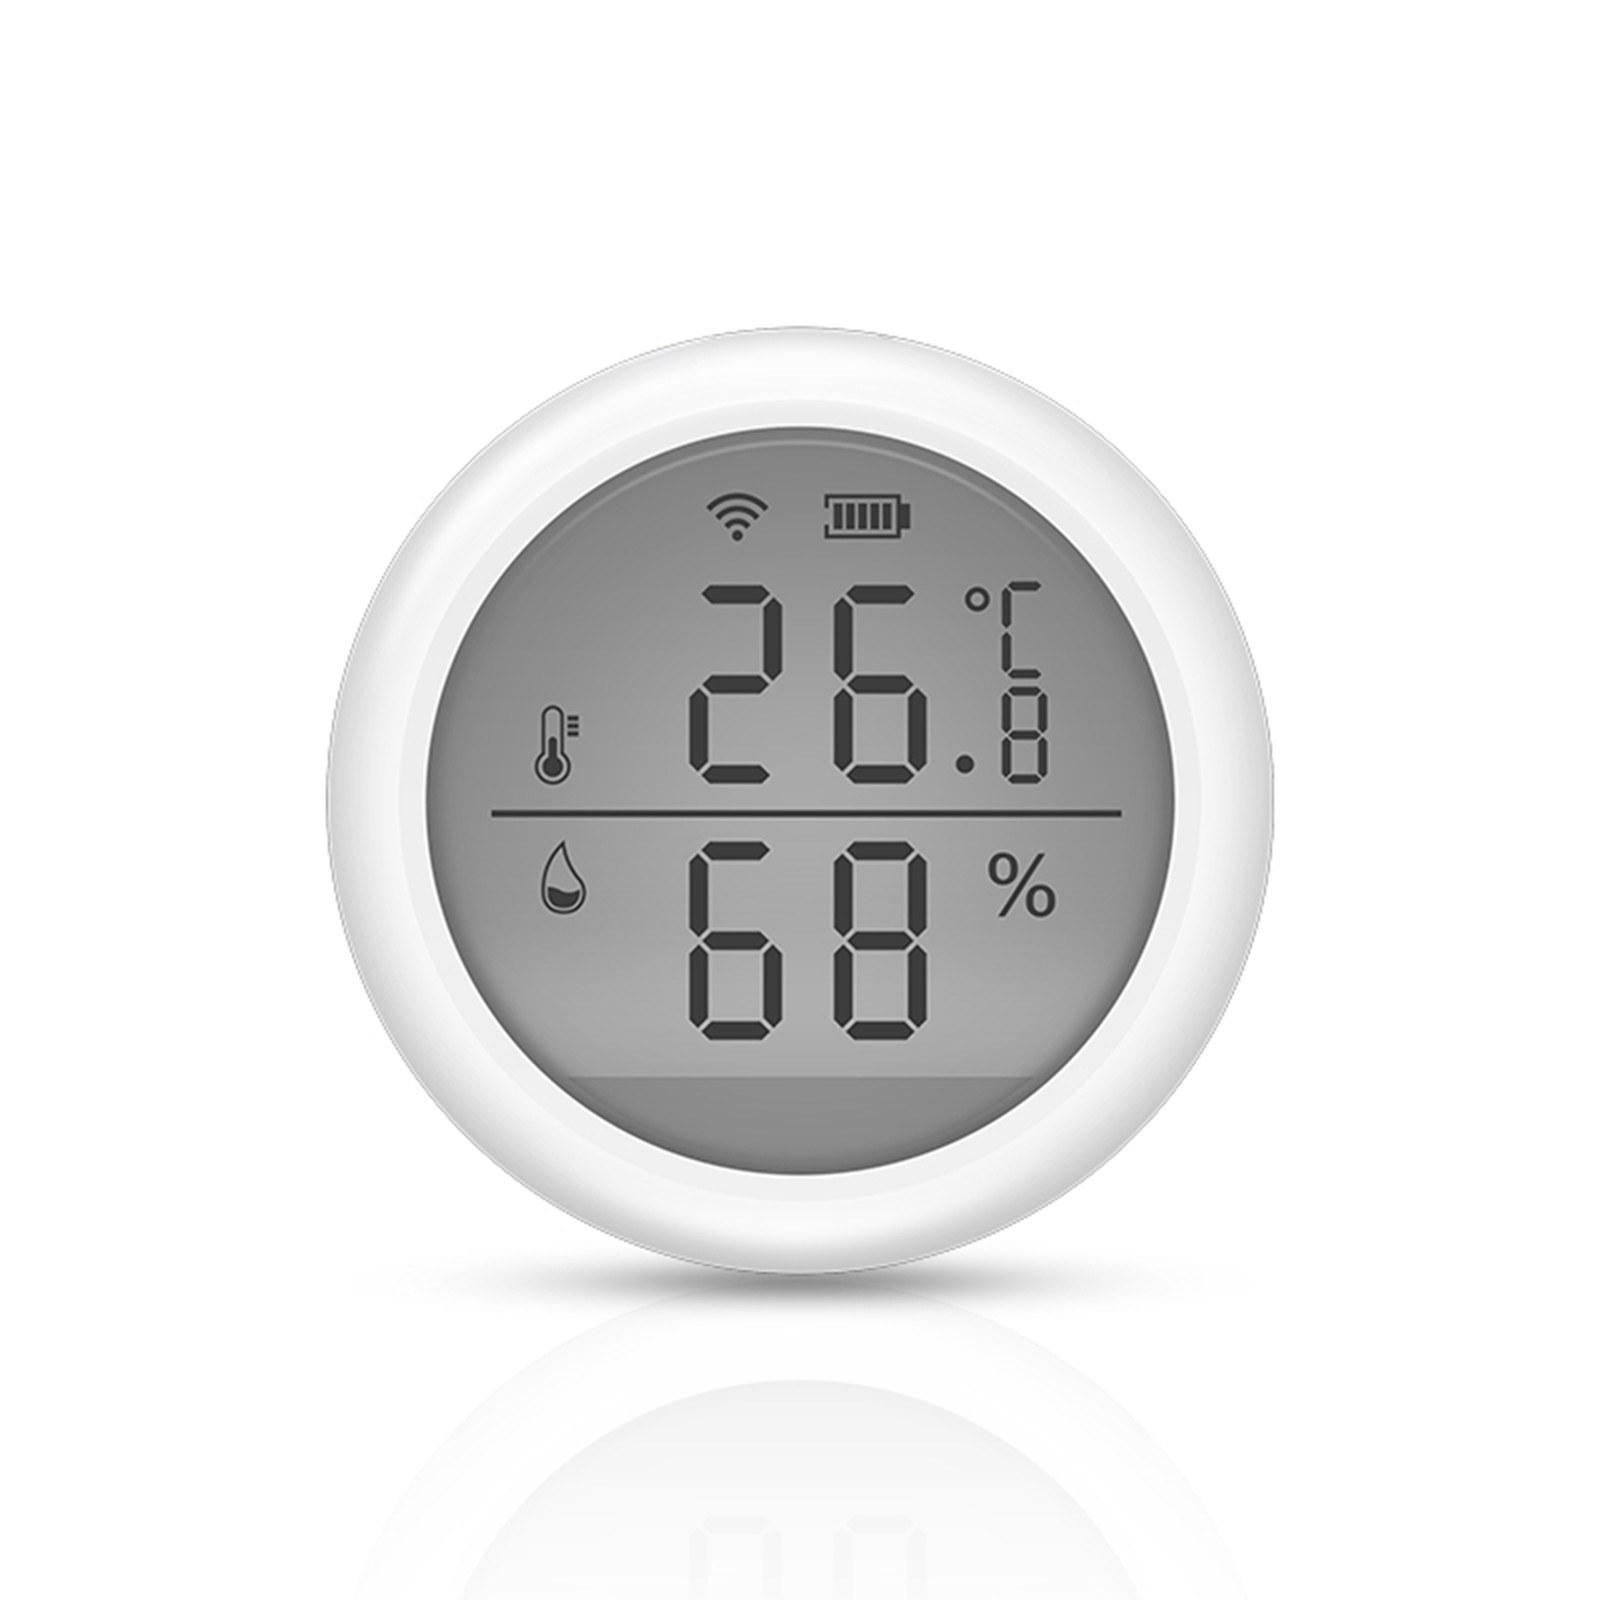 Tomtop - 49% OFF WiFi Smart Temperature Humidity Sensor Tuya APP Remote Control, $18.99 (Inclusive of VAT)